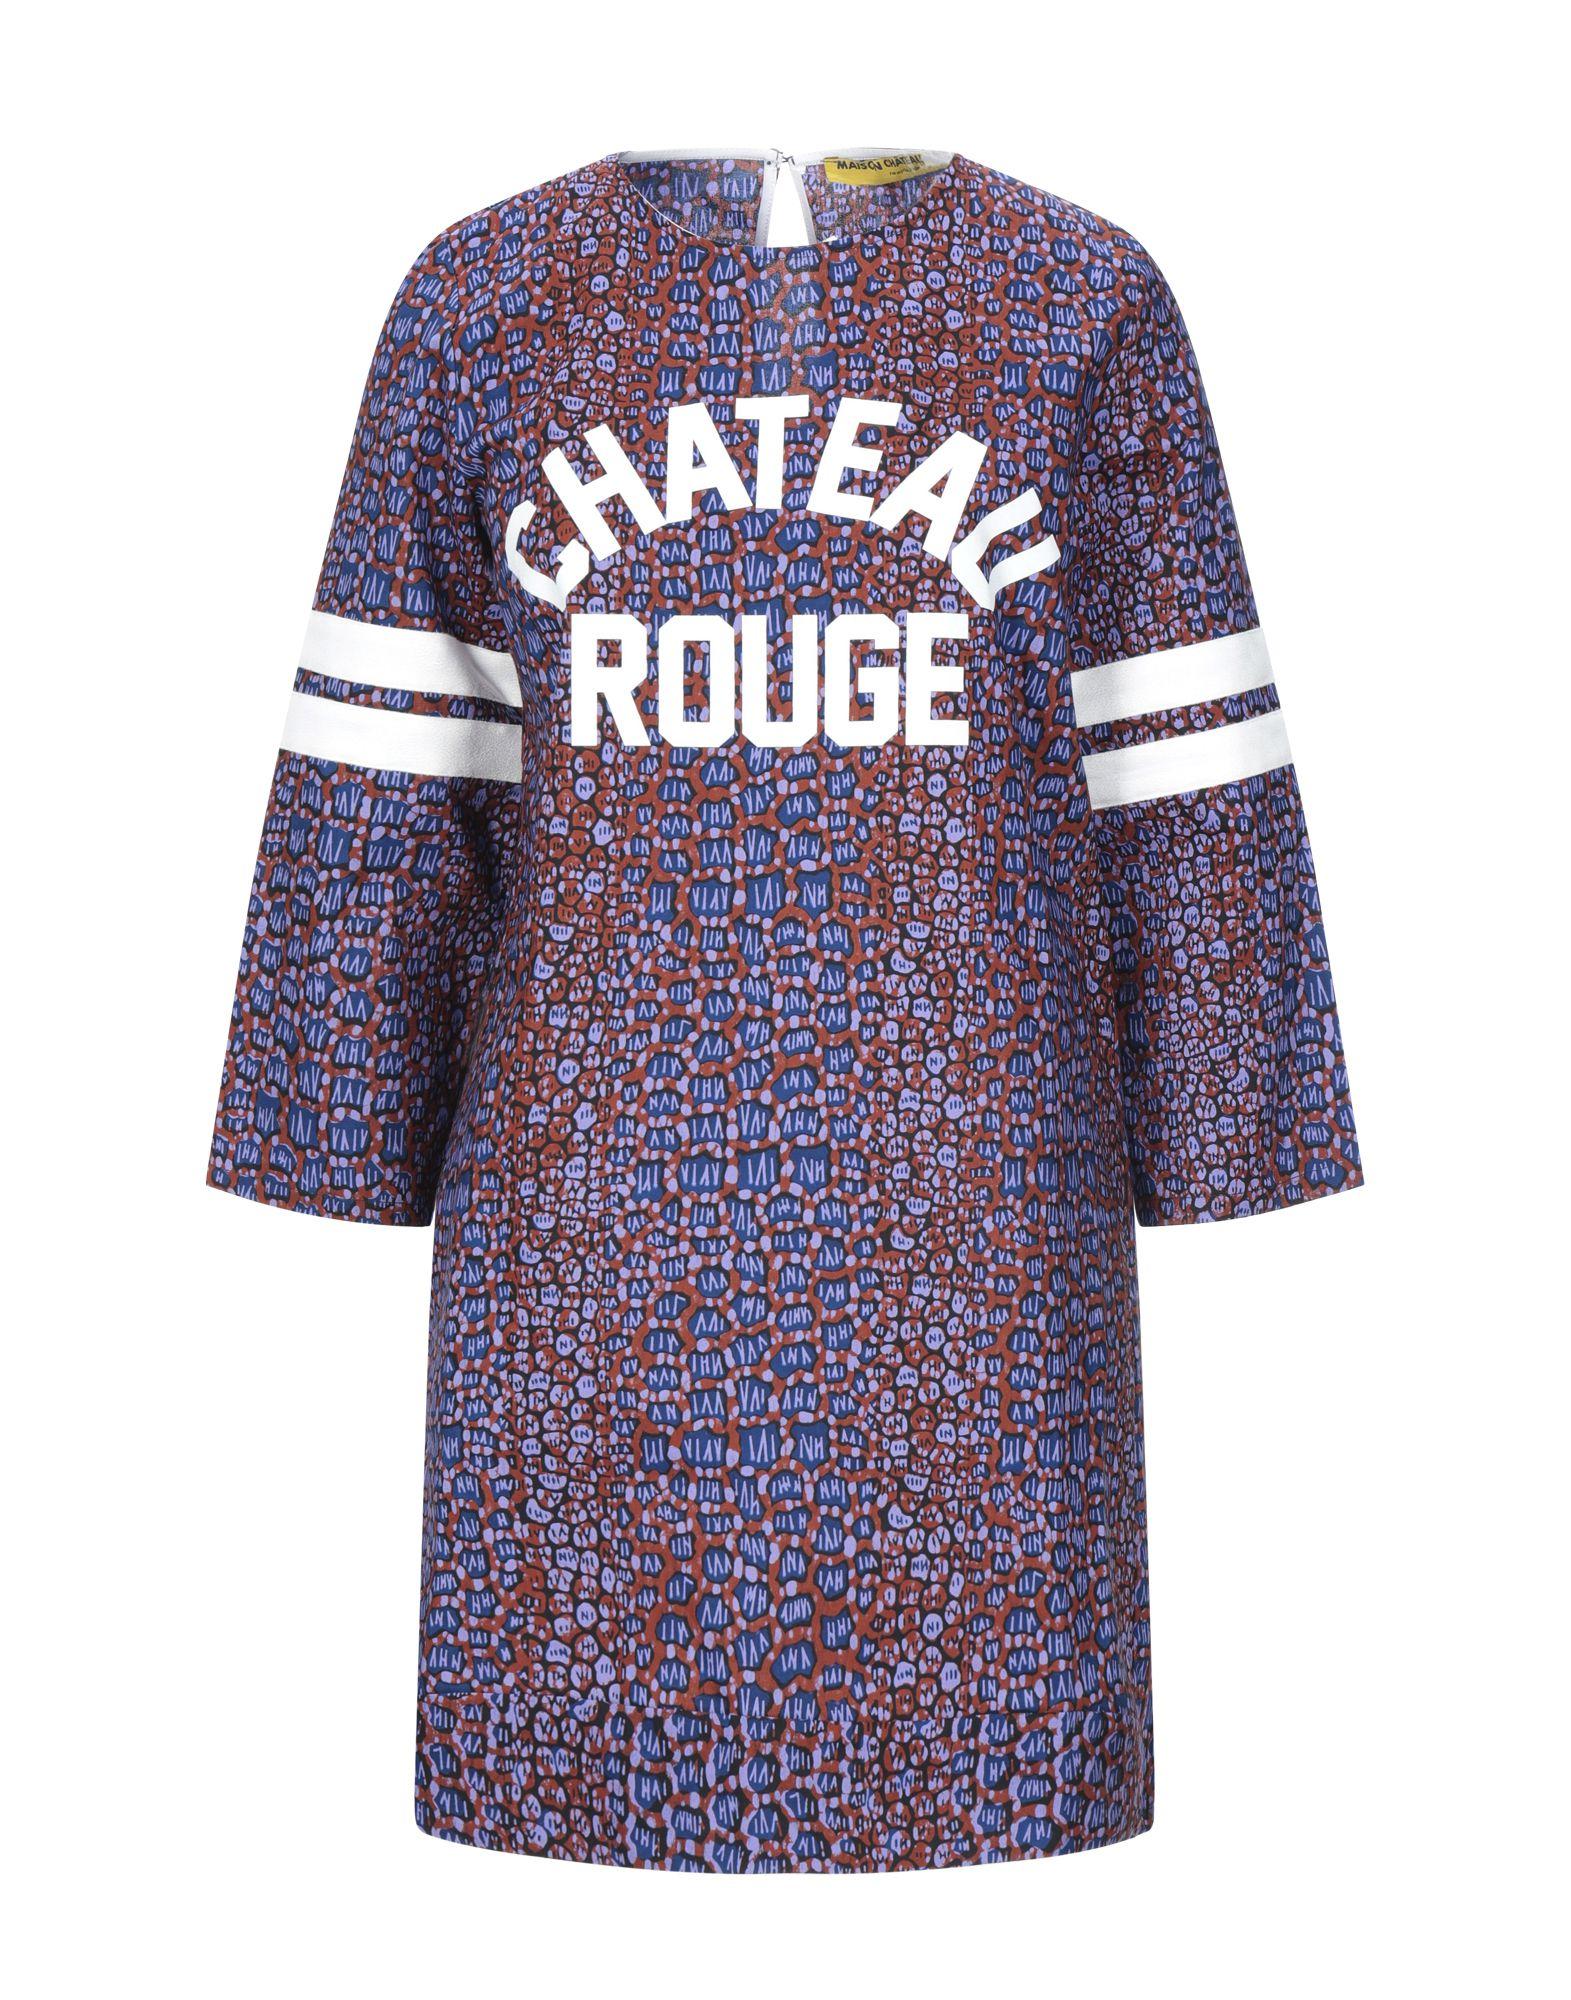 MAISON CHÂTEAU ROUGE Короткое платье